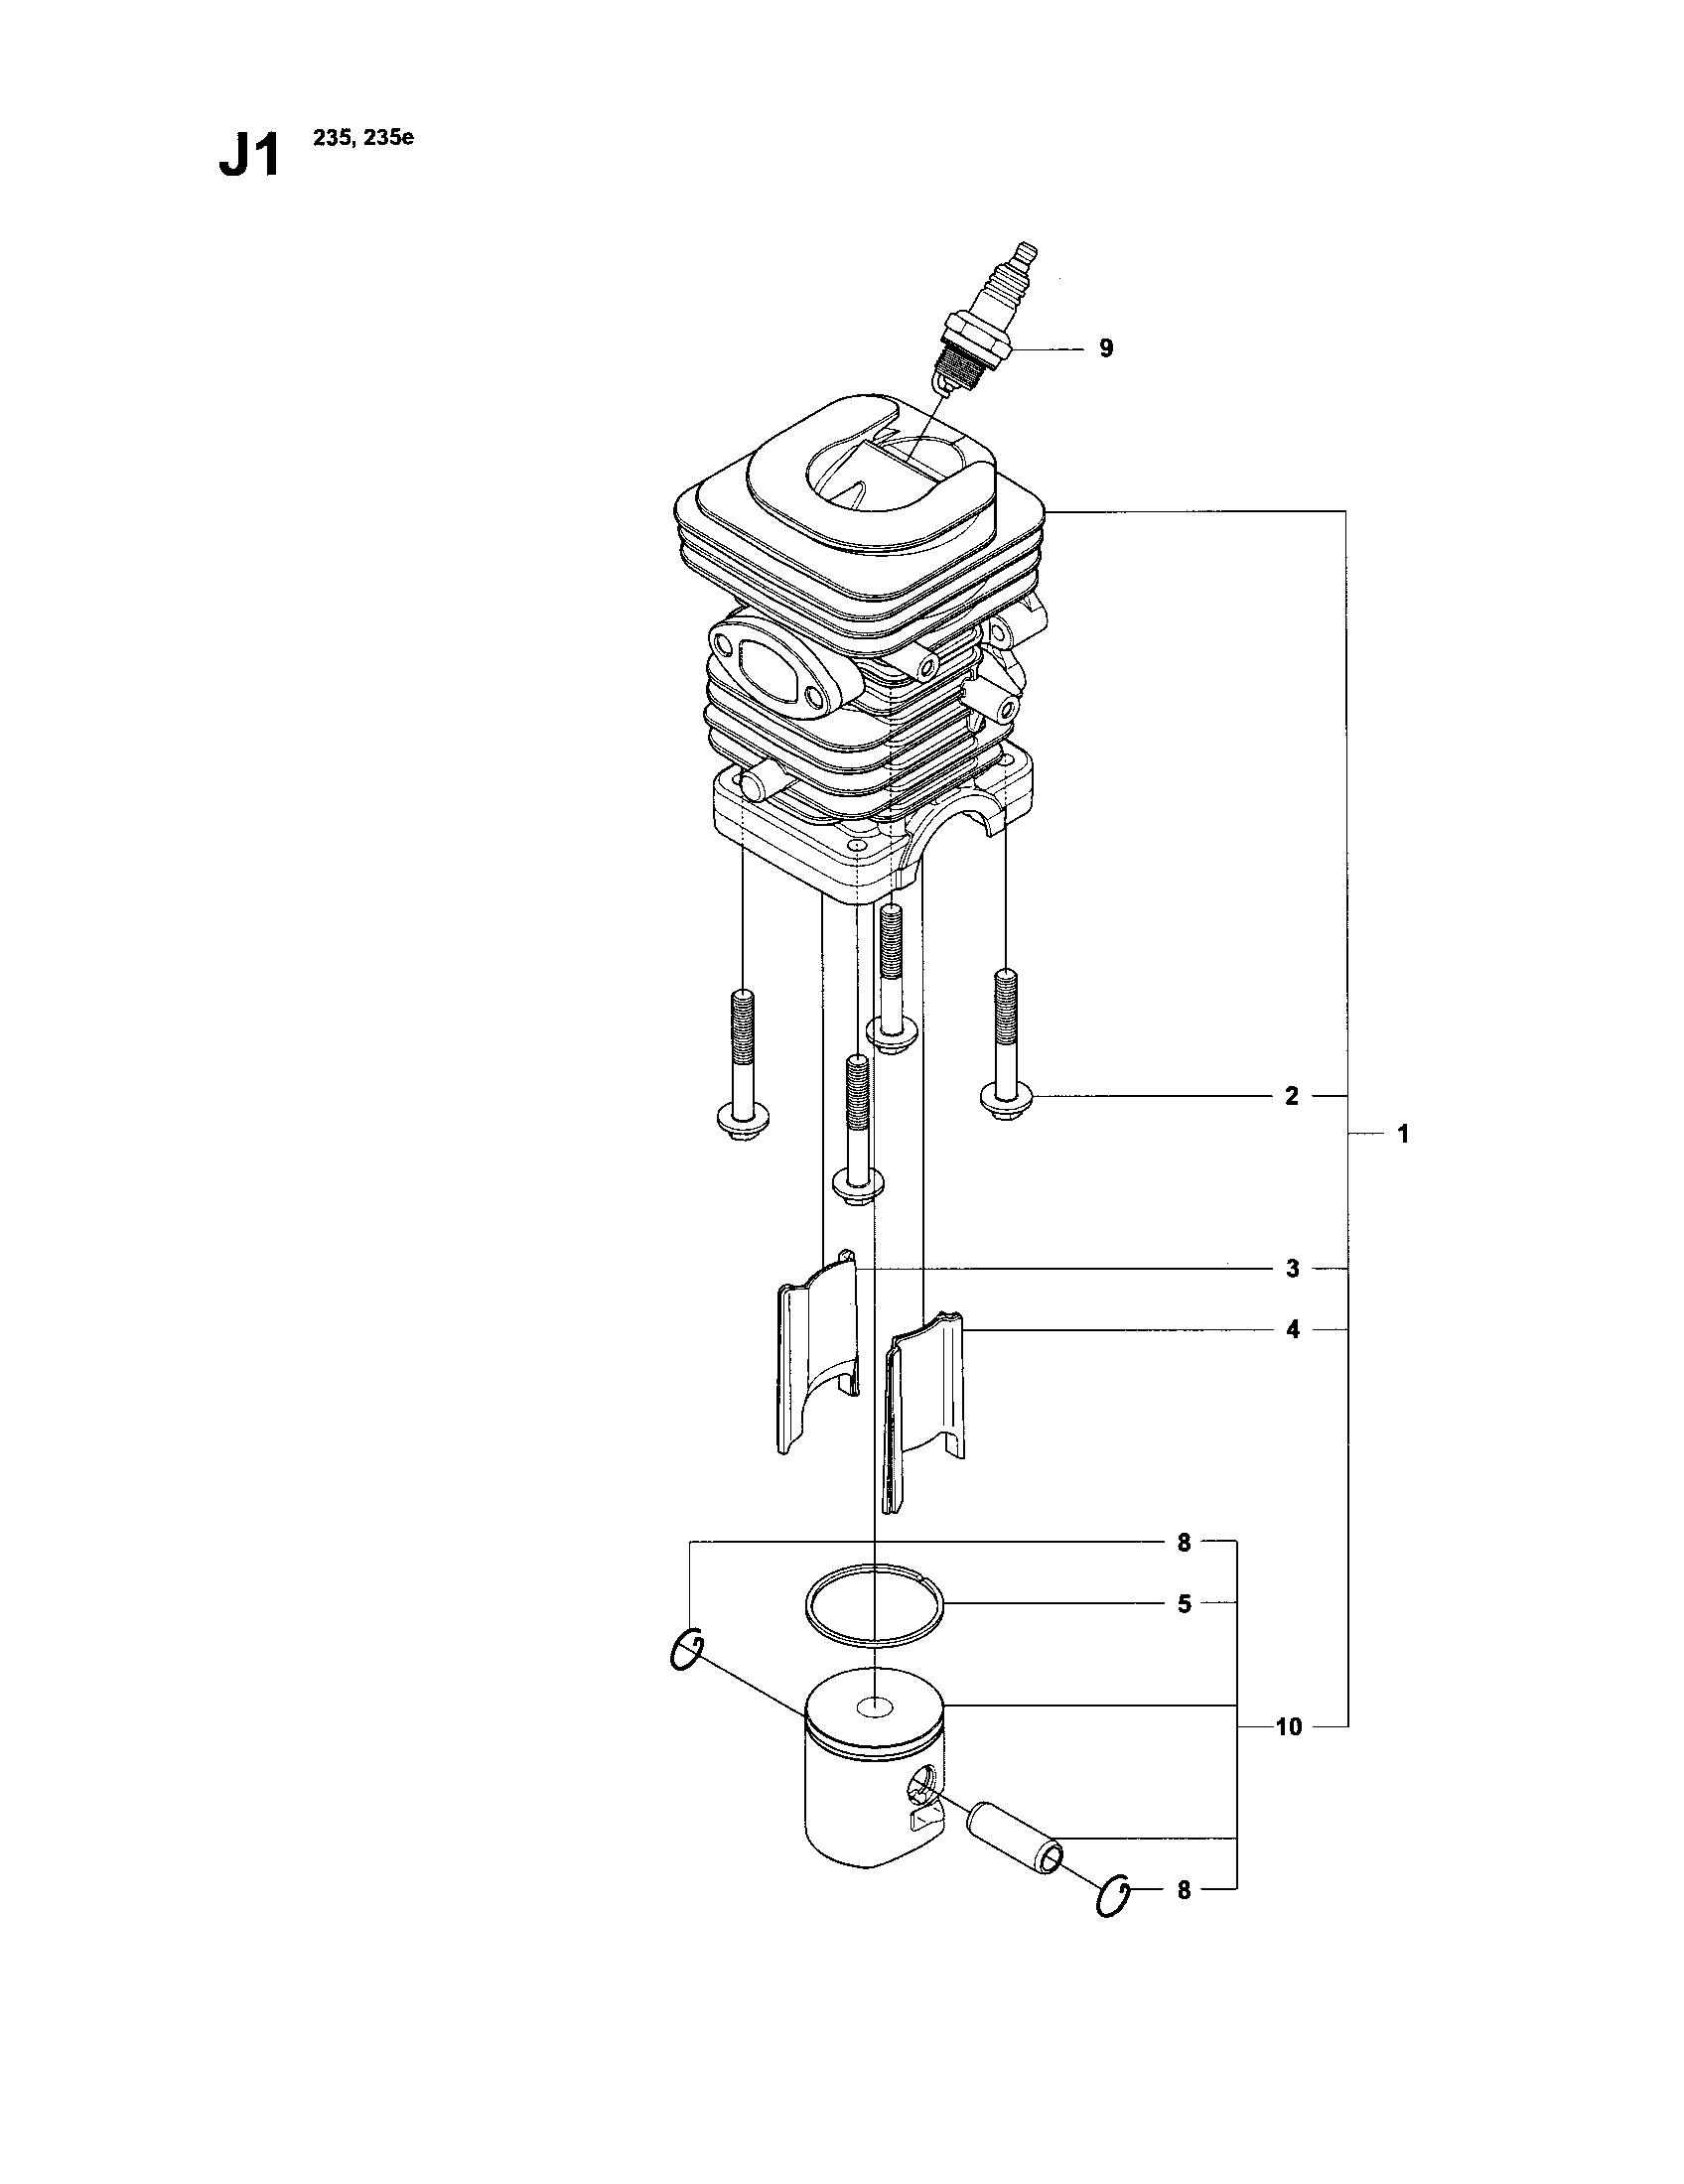 Husqvarna model 240 chainsaw, gas genuine parts